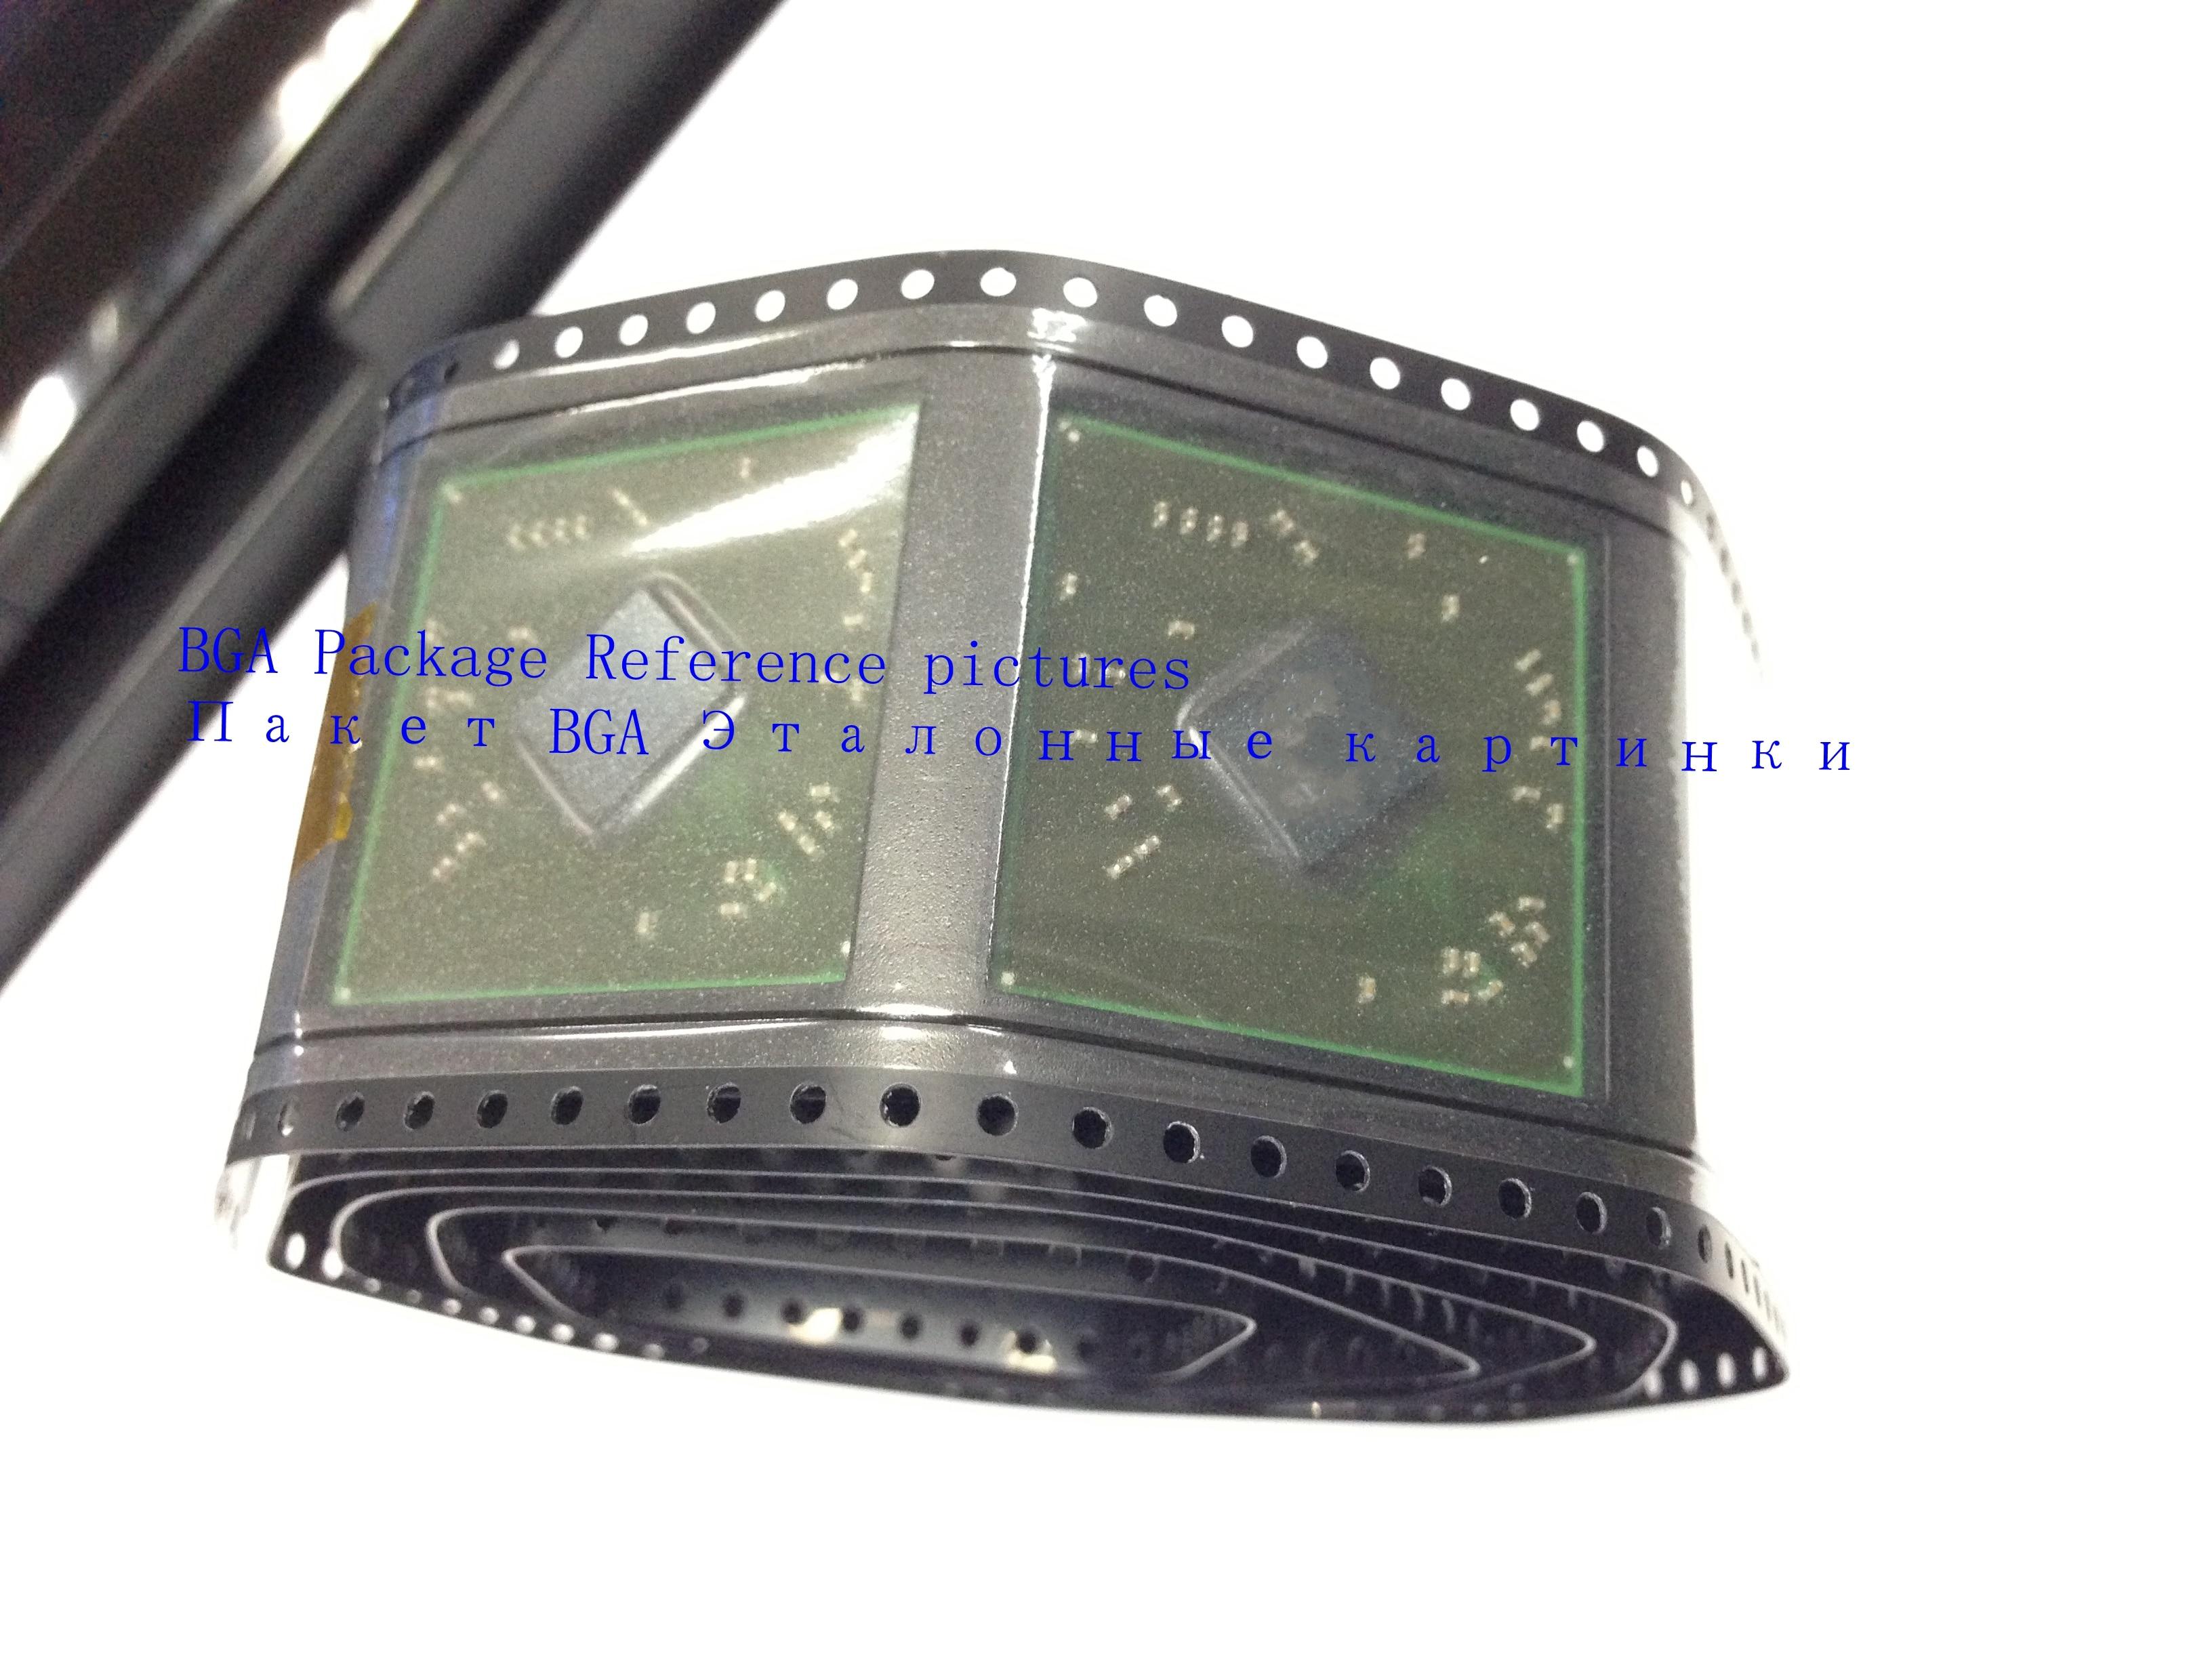 1 pcs/lot 100% nouveau N13P-GT-W-A2 N13P GT W A2 BGA Chipset1 pcs/lot 100% nouveau N13P-GT-W-A2 N13P GT W A2 BGA Chipset